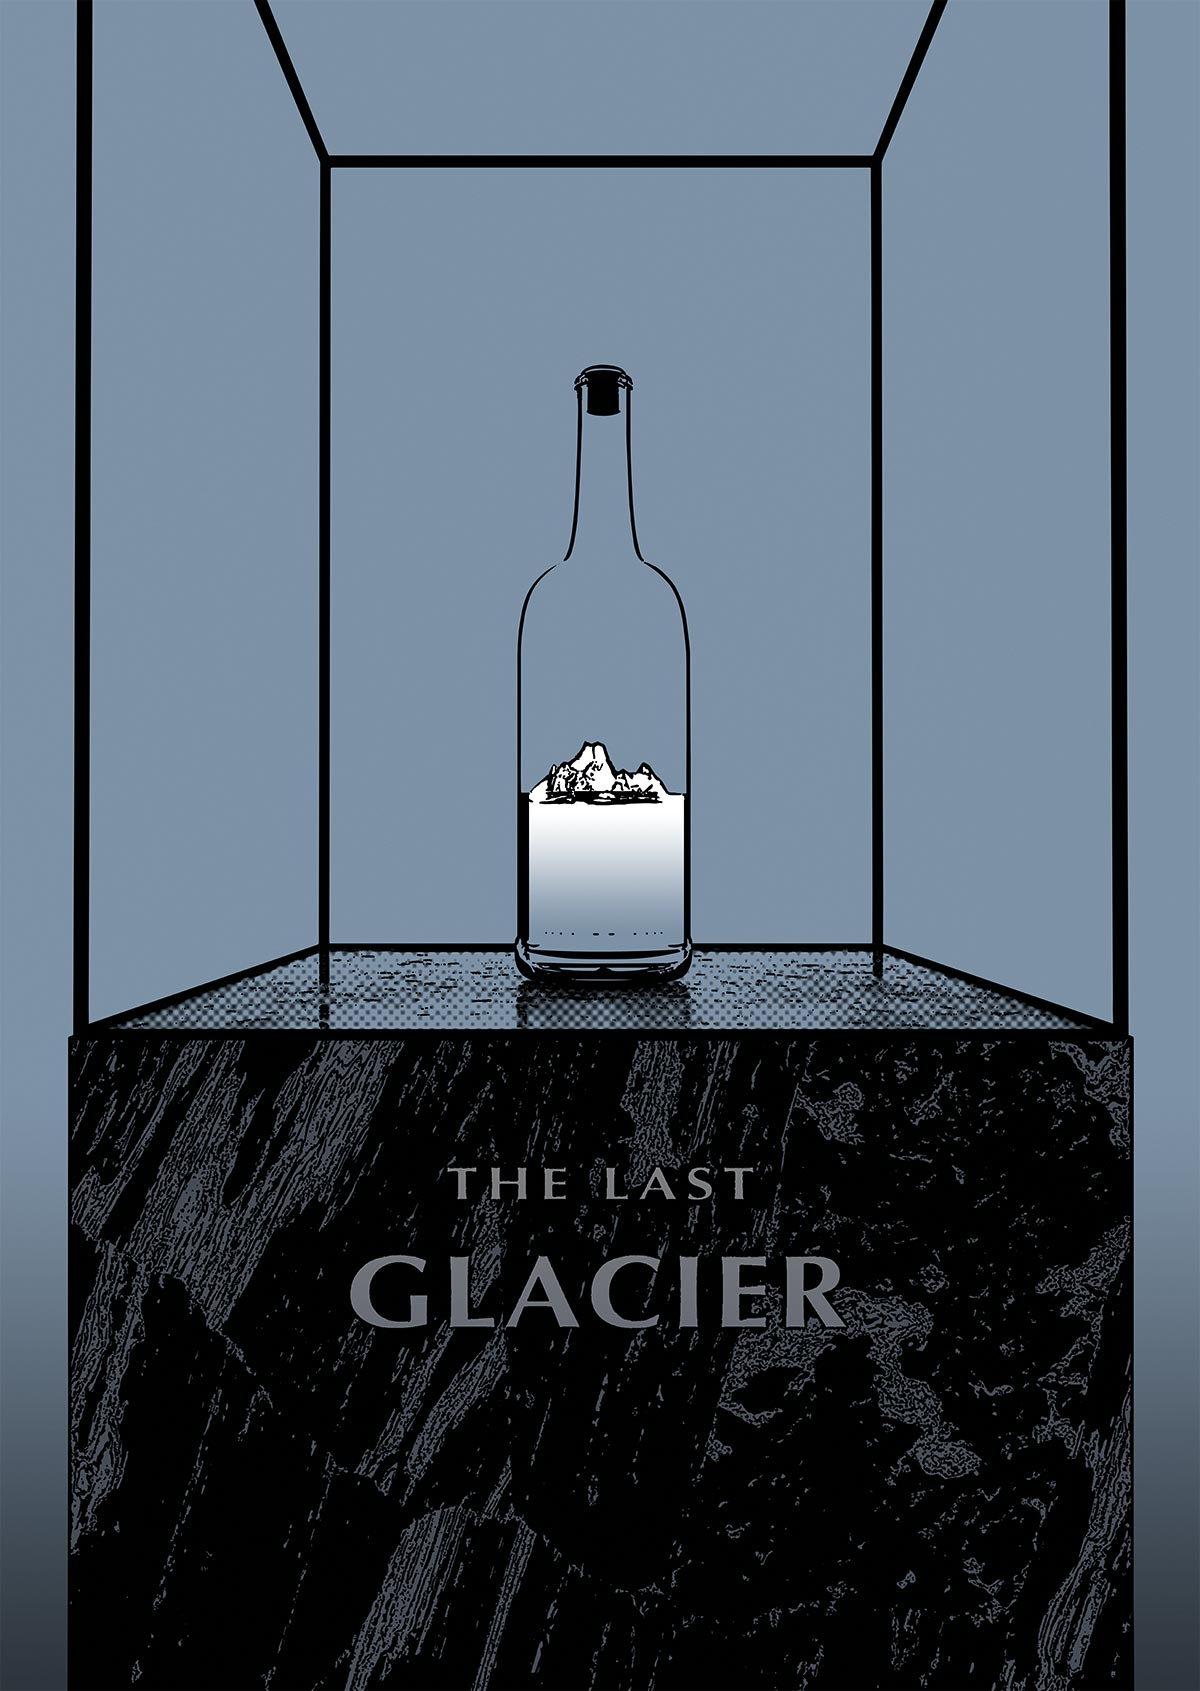 The Last Glacier